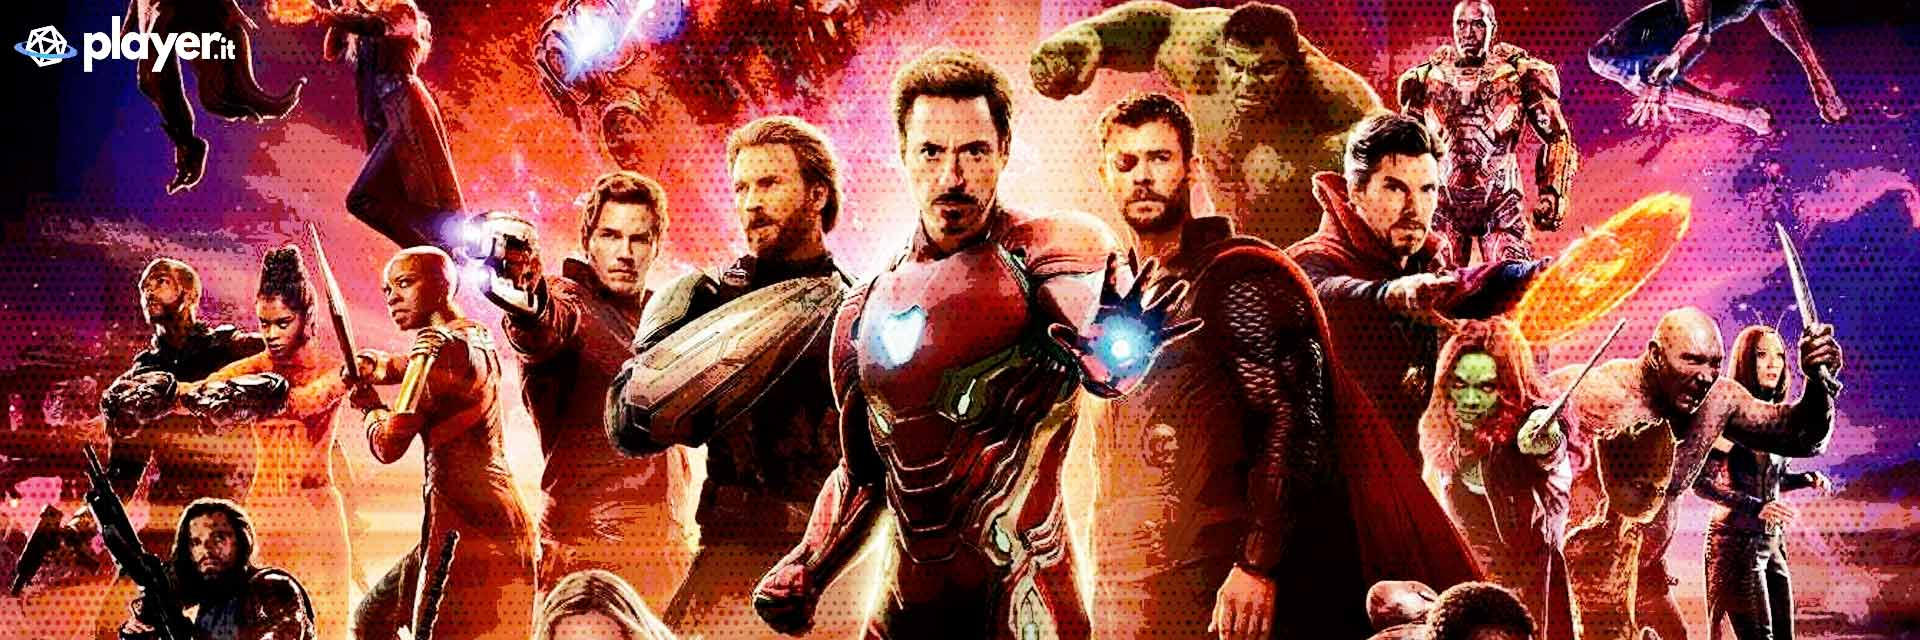 immagine in evidenza del gioco Marvel's Avengers